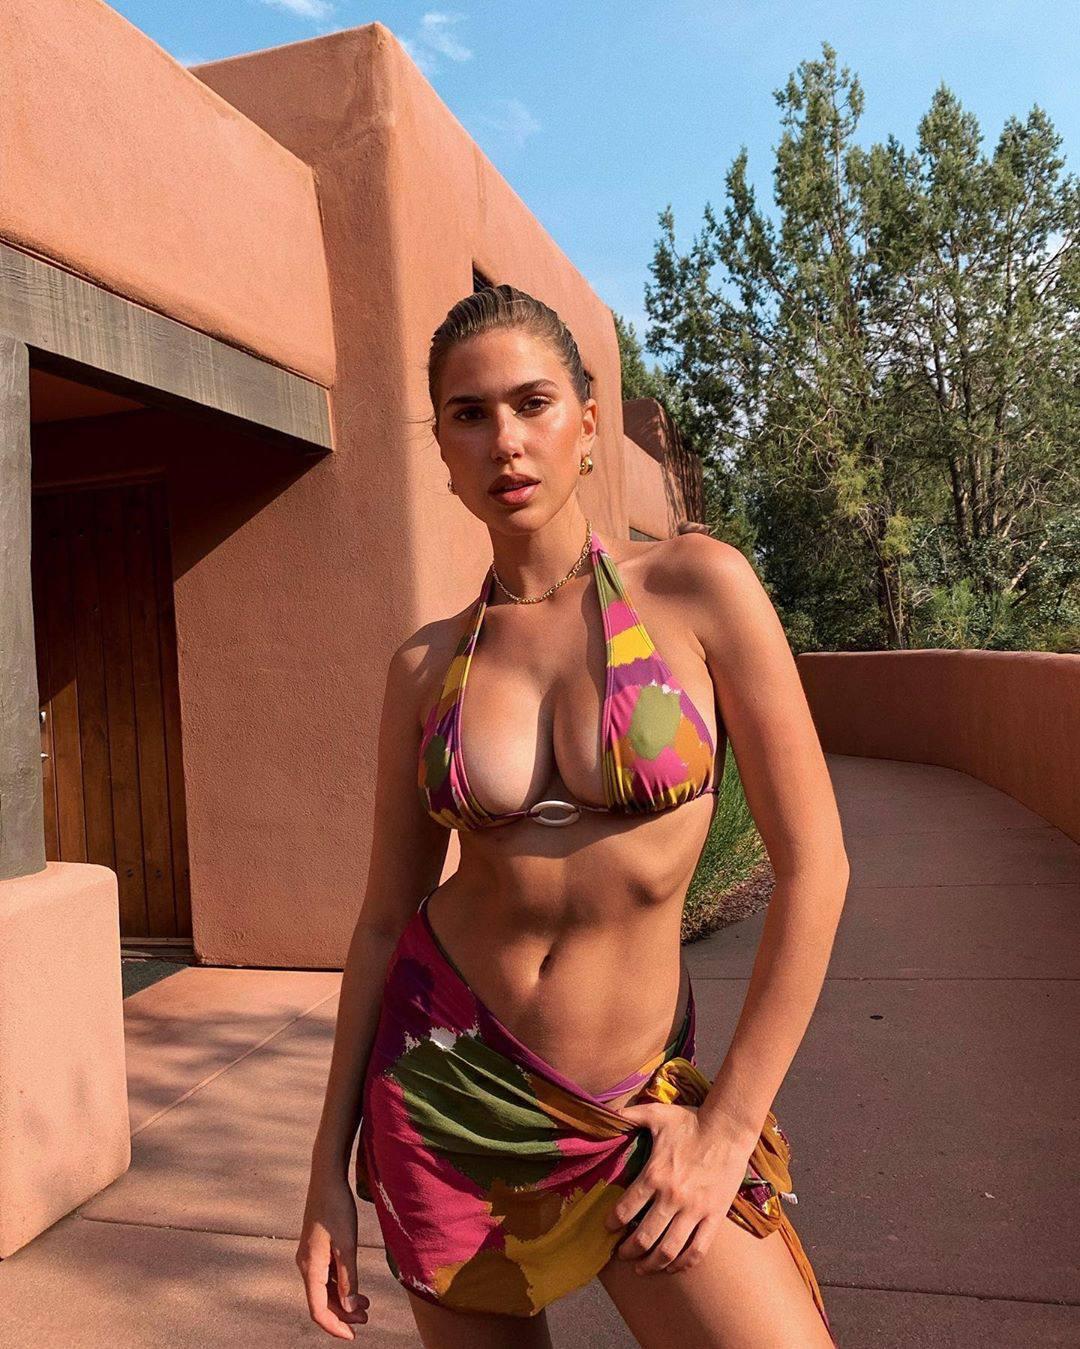 Kara Del Toro Beautiful Tits In Bikini